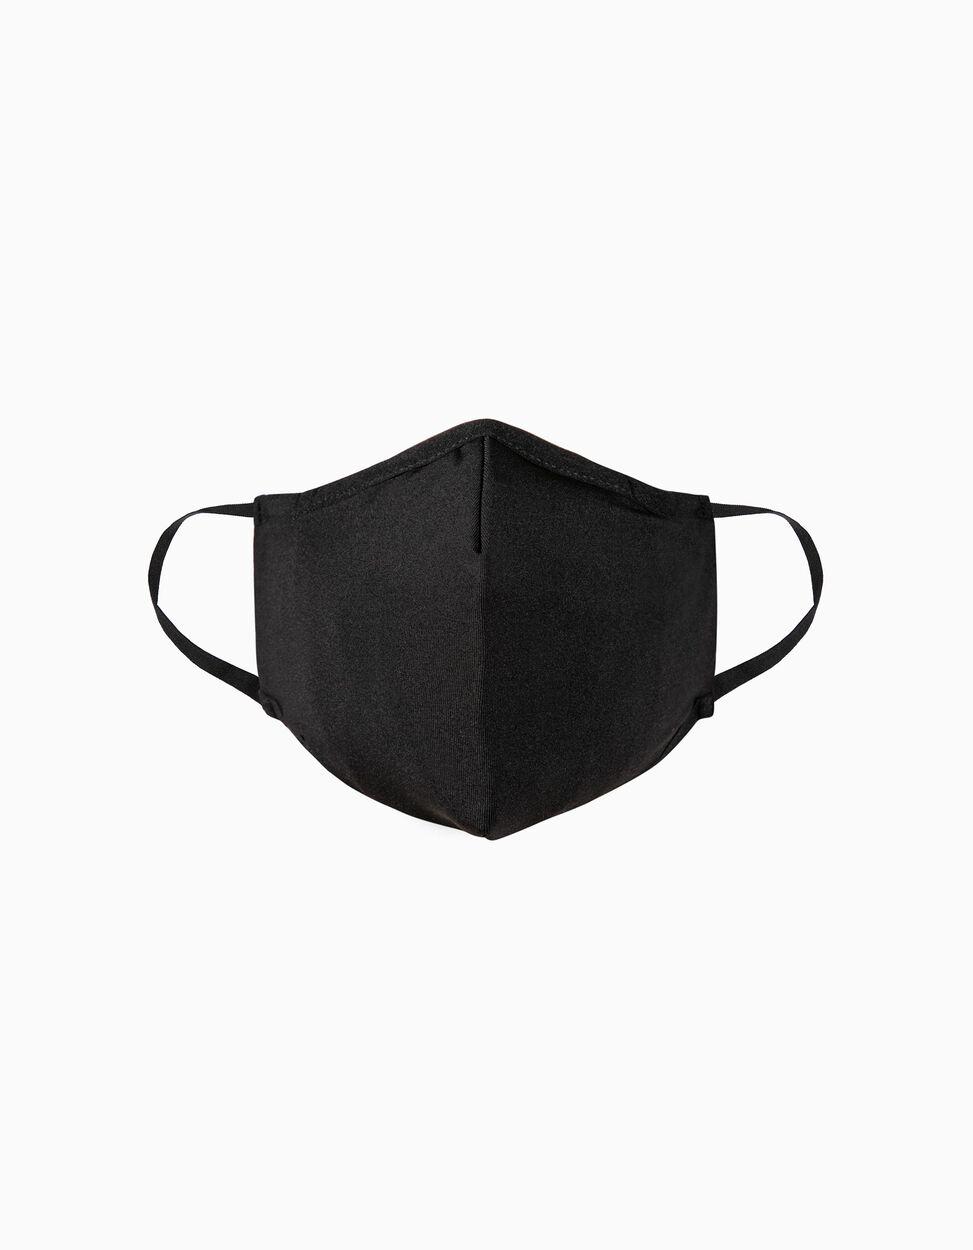 Community Mask